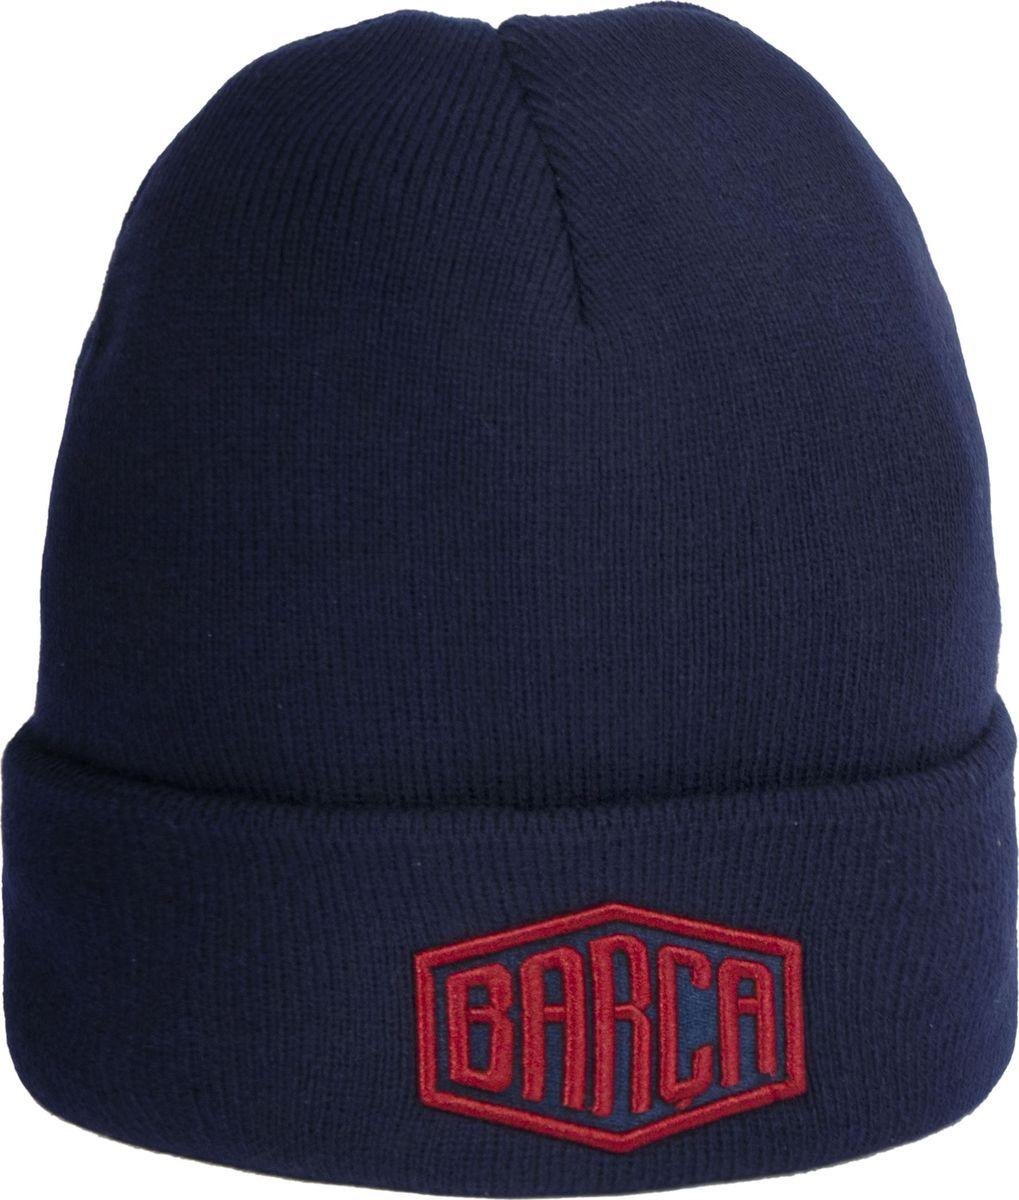 Шапка мужская Atributika & Club Barcelona, цвет: темно-синий. 115119. Размер 55/58 шапка мужская с отворотом crew